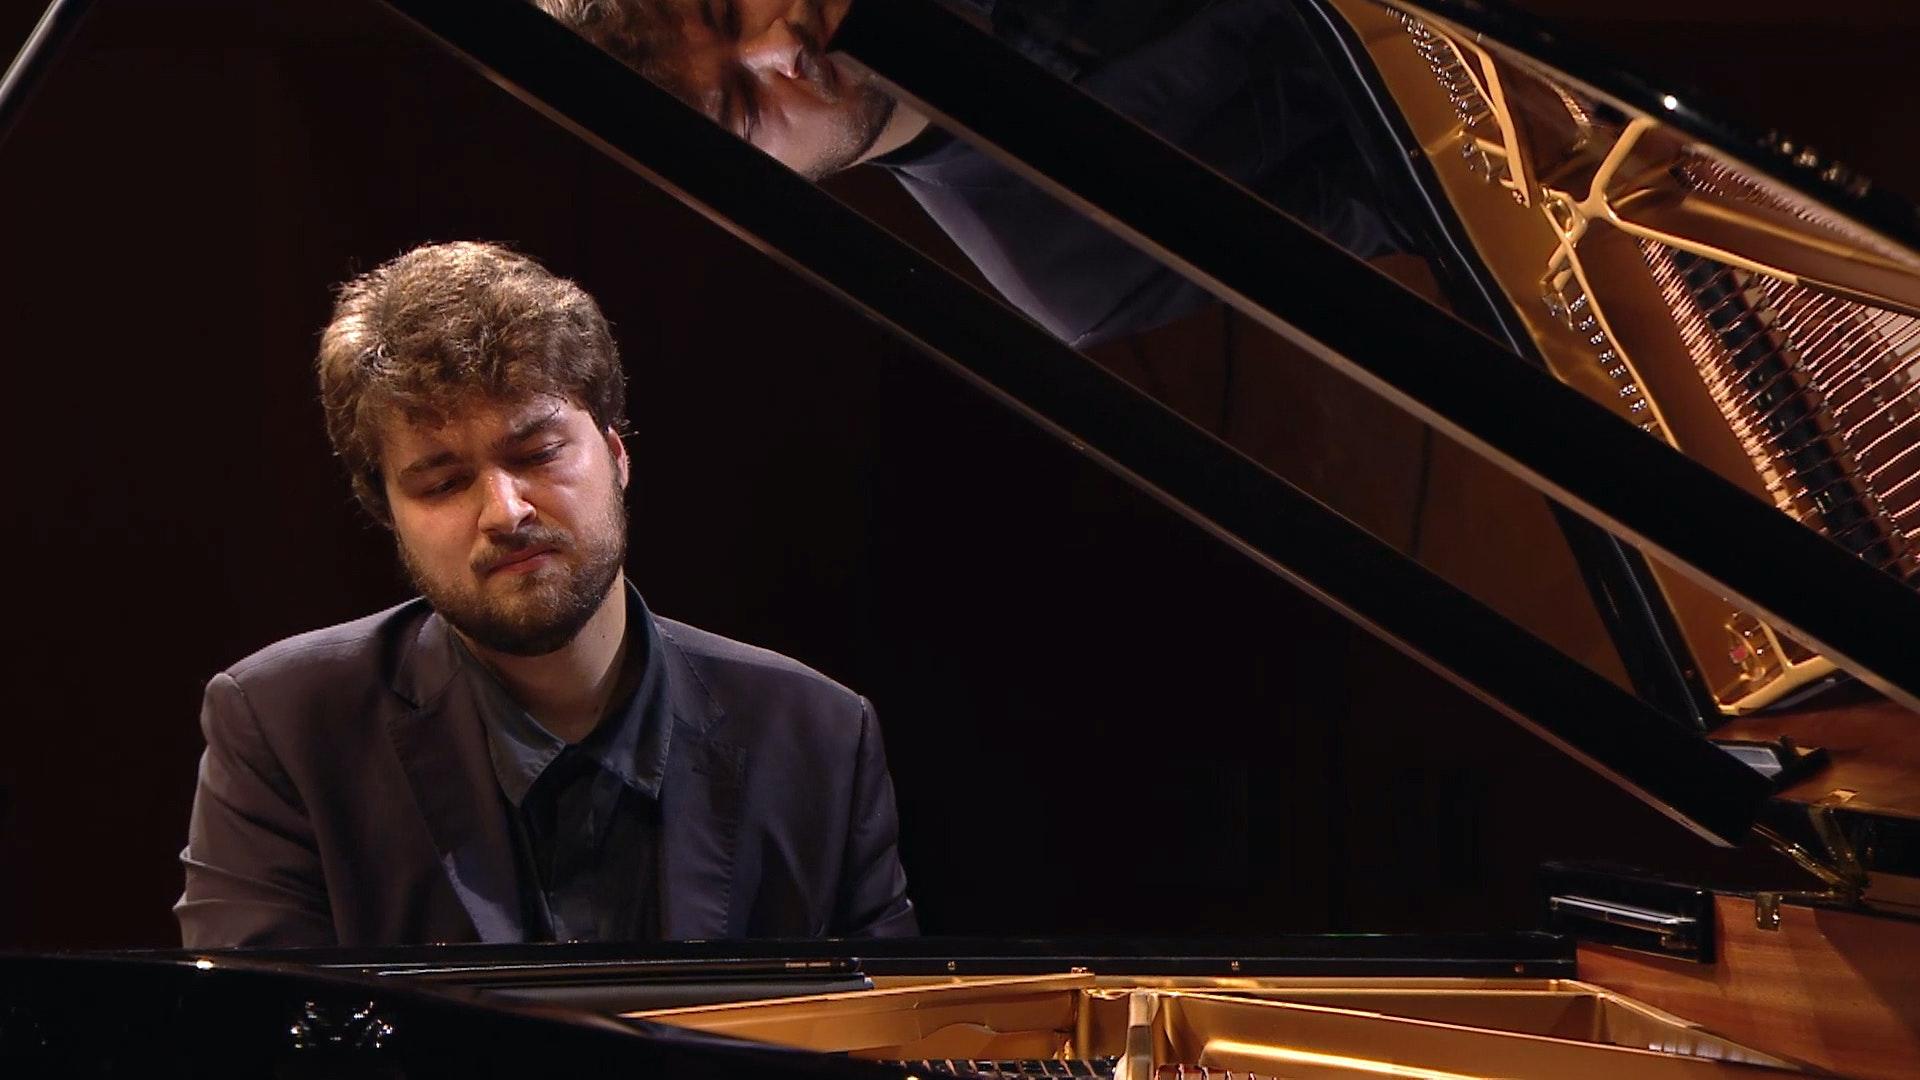 Lukas Geniušas joue la Sonate pour piano n°7 de Prokofiev